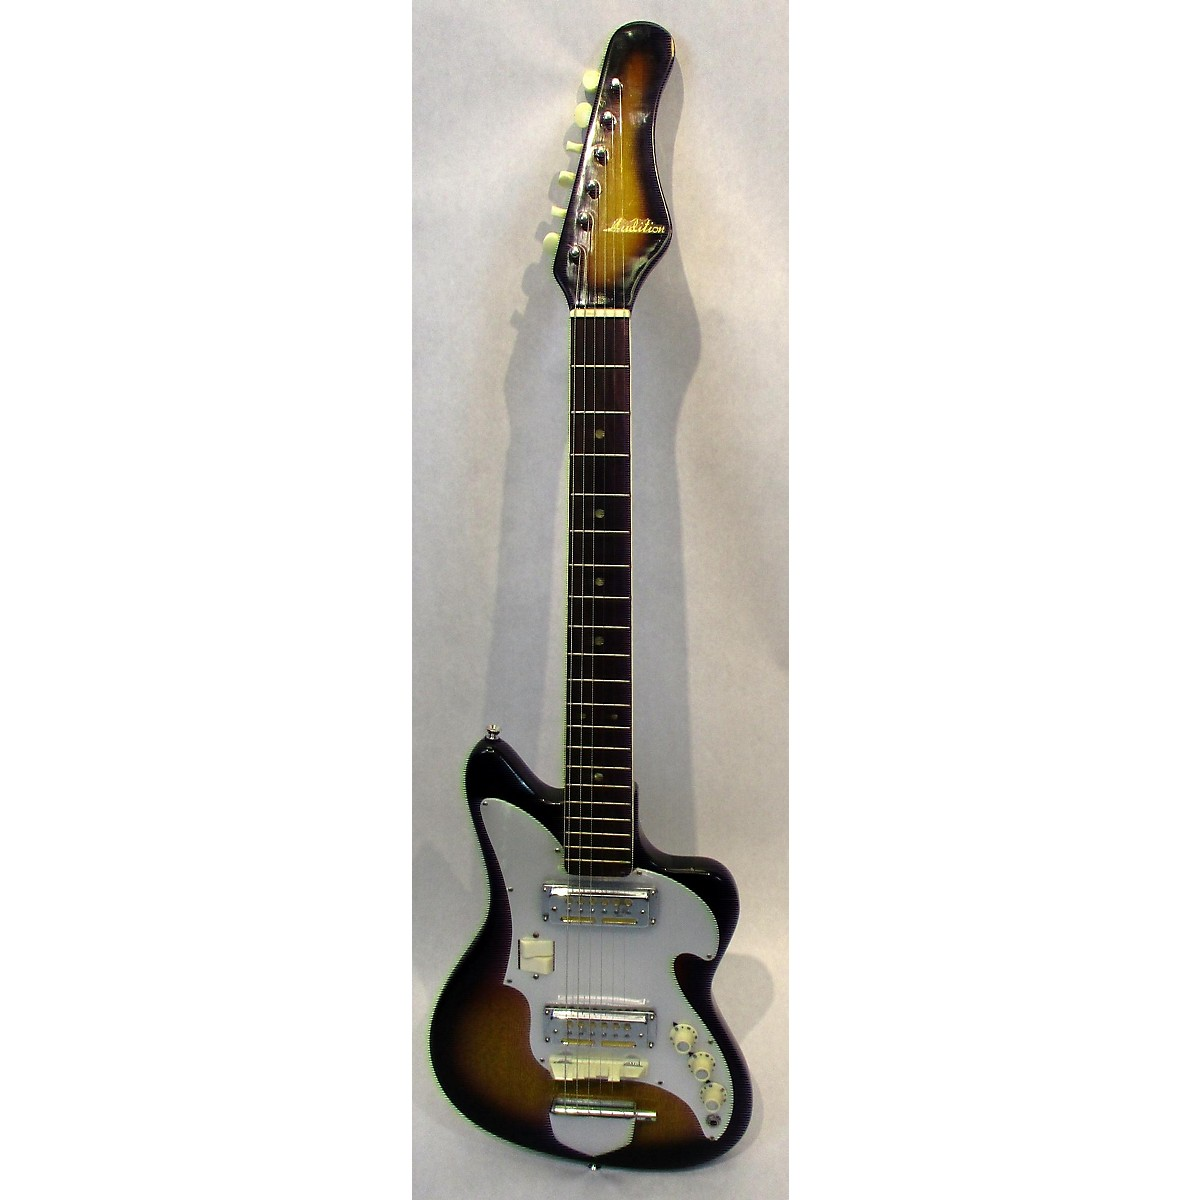 In Store Vintage Vintage 1960s Audition Guitar Sunburst Solid Body Electric Guitar